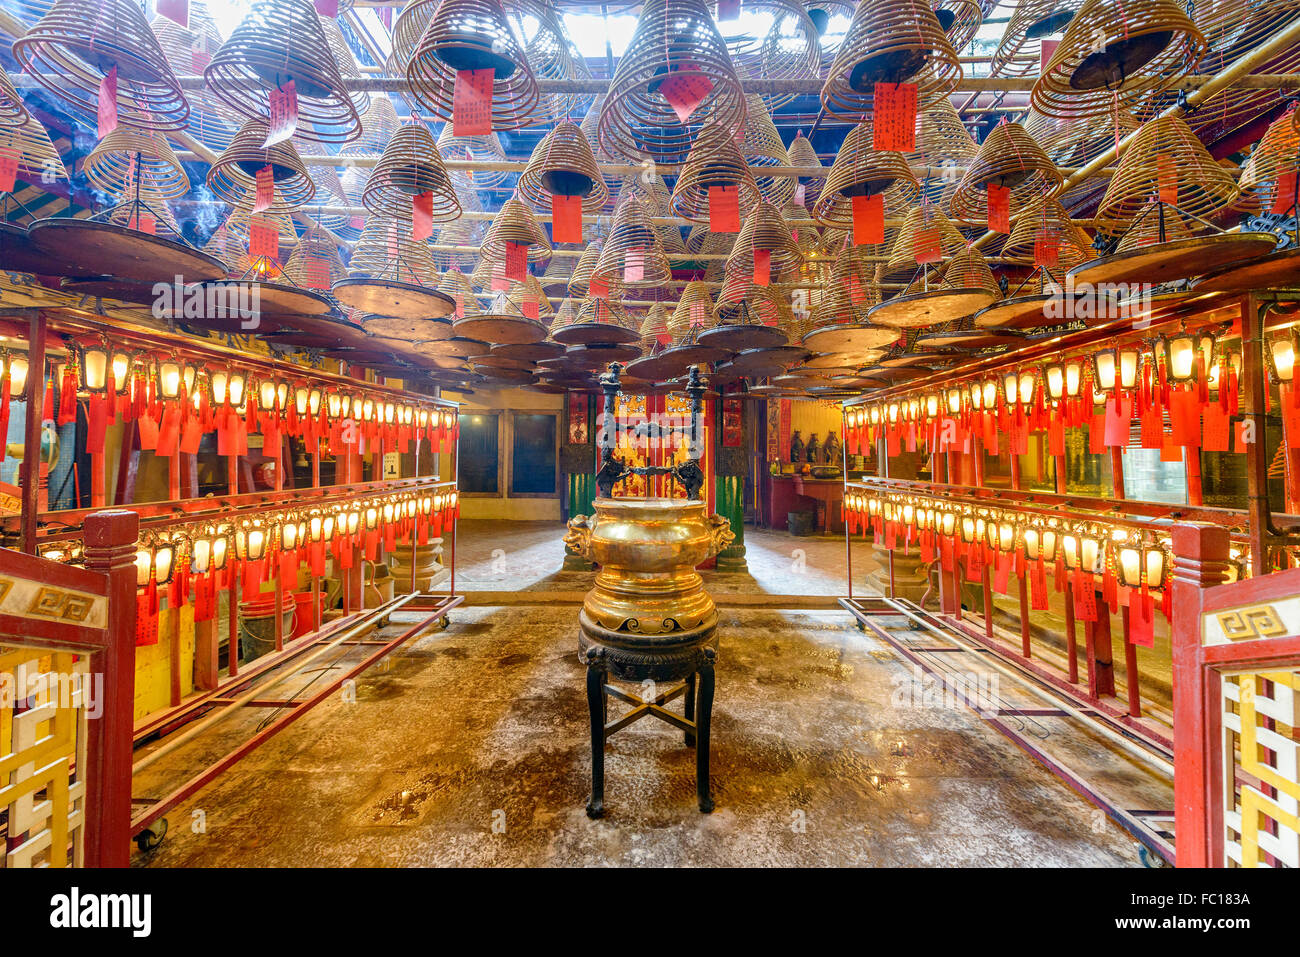 L'interno del Tempio di Man Mo a Hong Kong, Cina. Immagini Stock